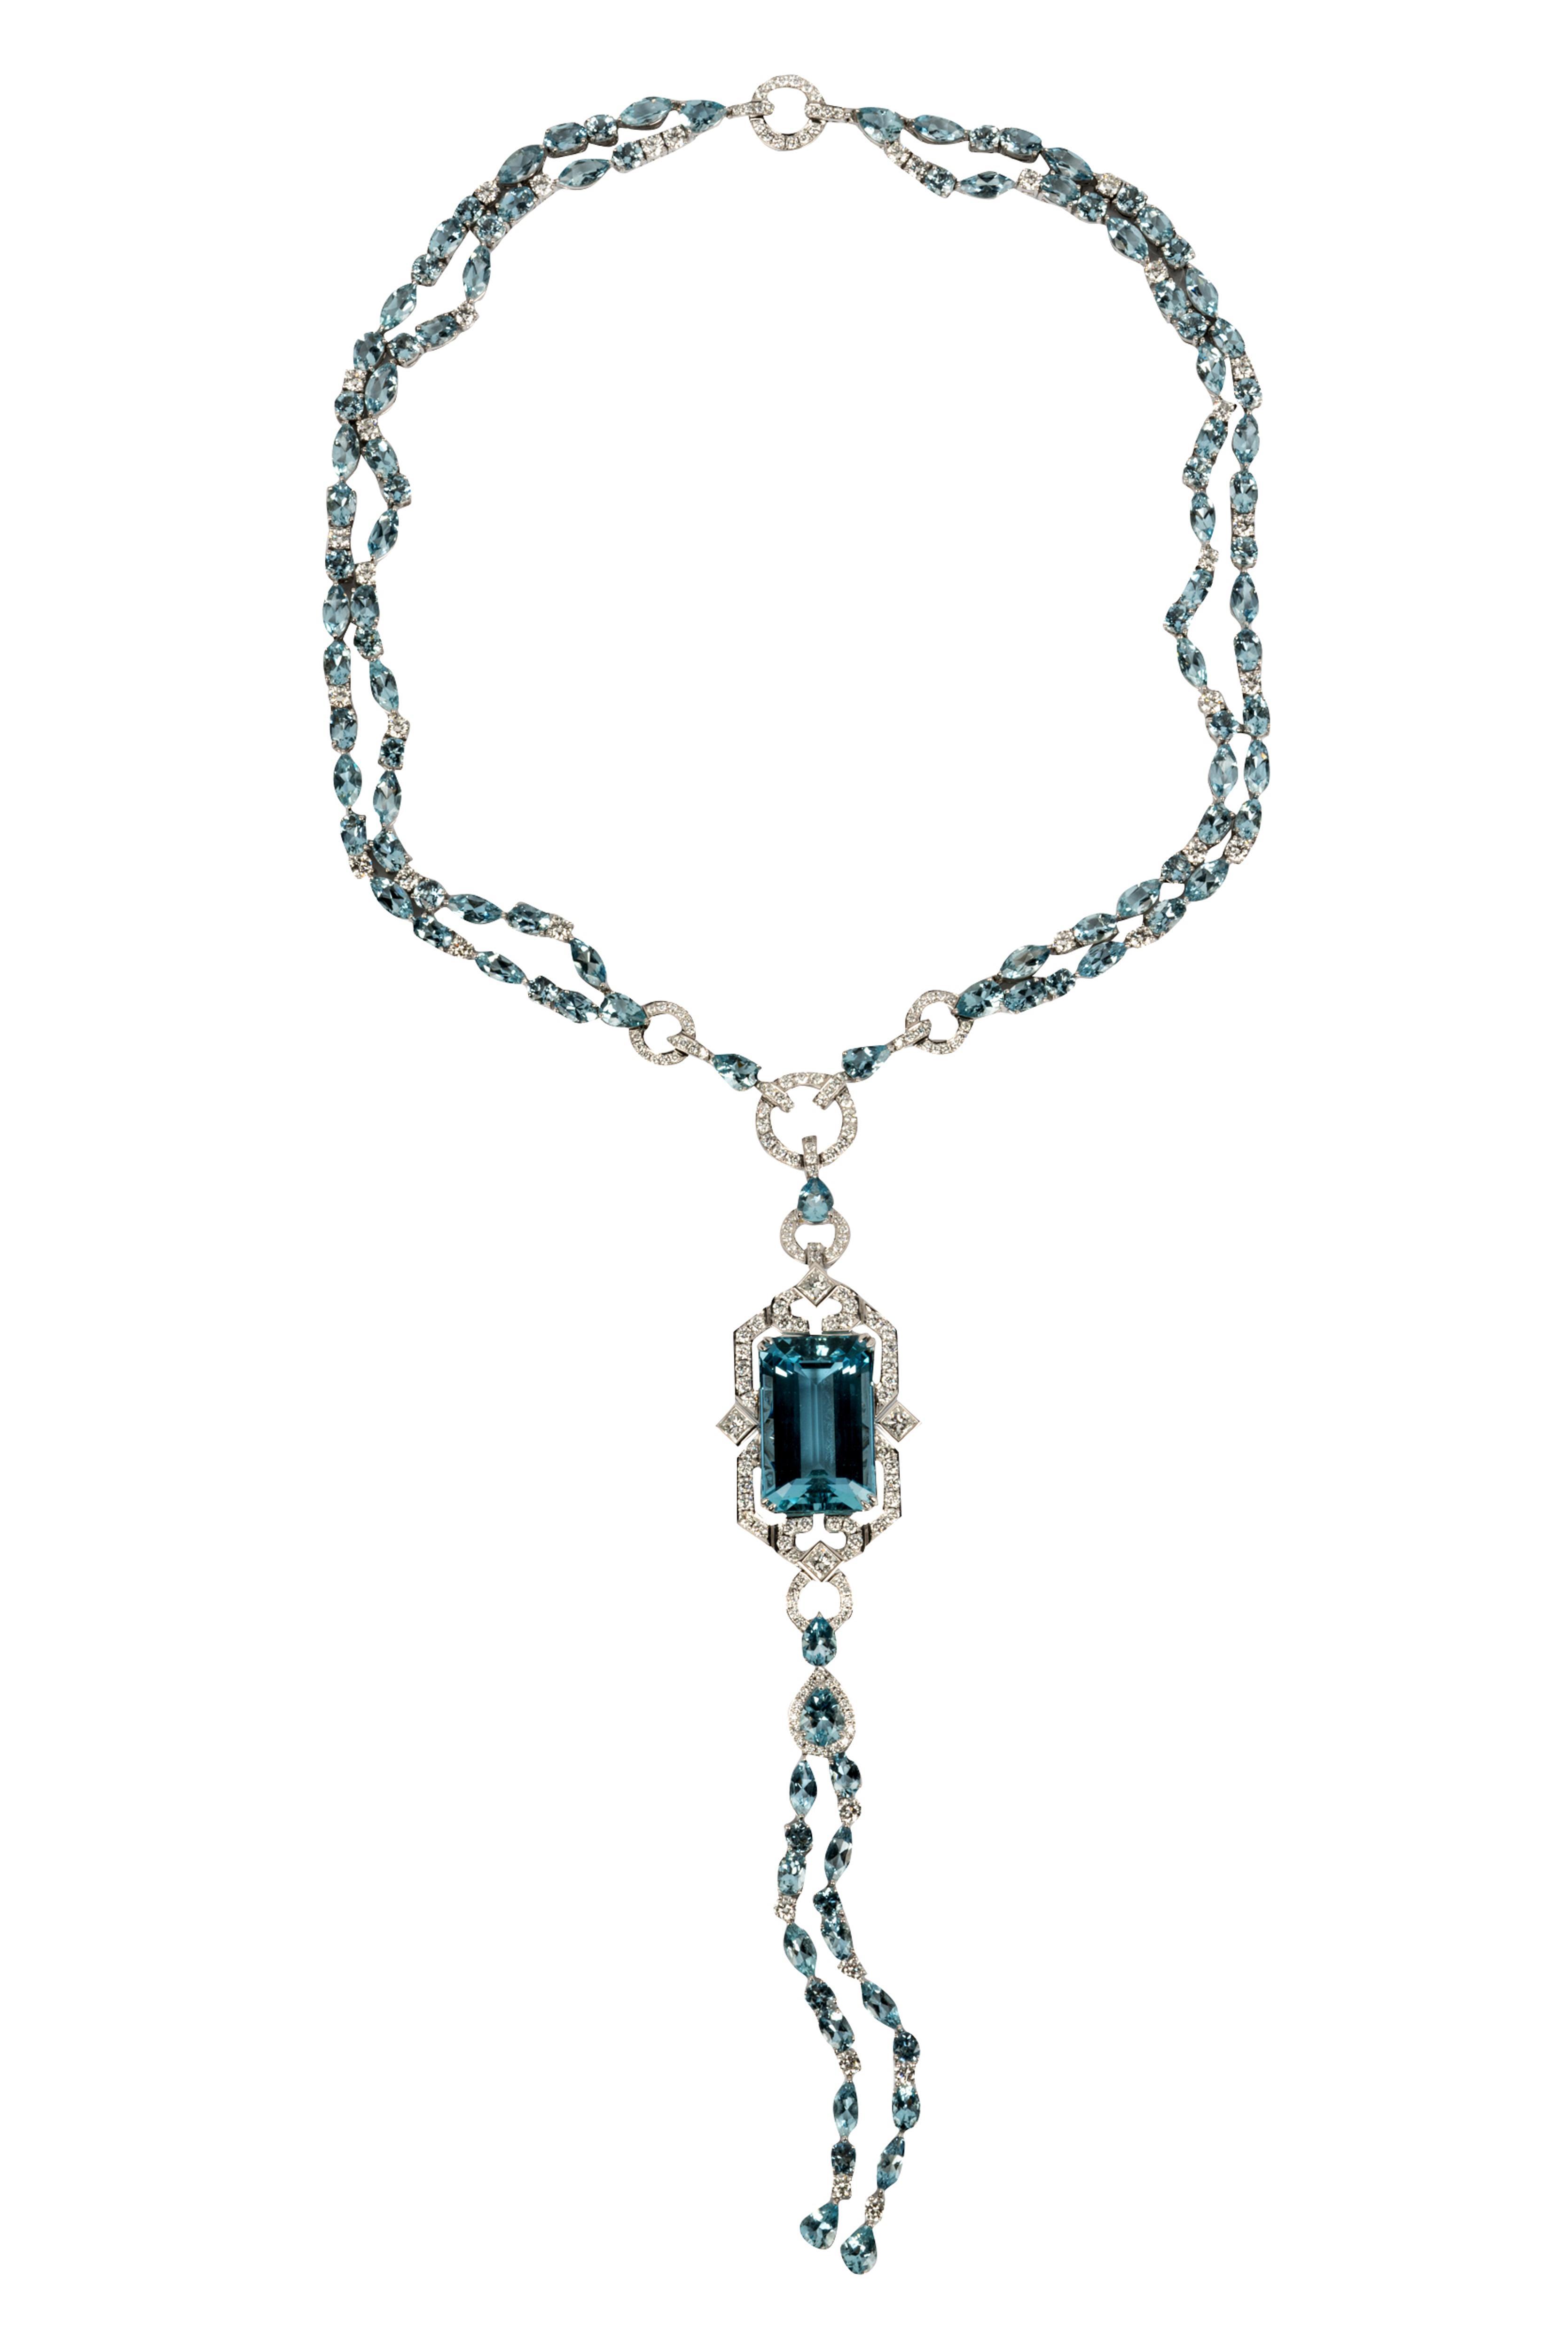 ART DECO STYLE 18 KARAT WHITE GOLD, DIAMOND, & AQUAMARINE NECKLACE